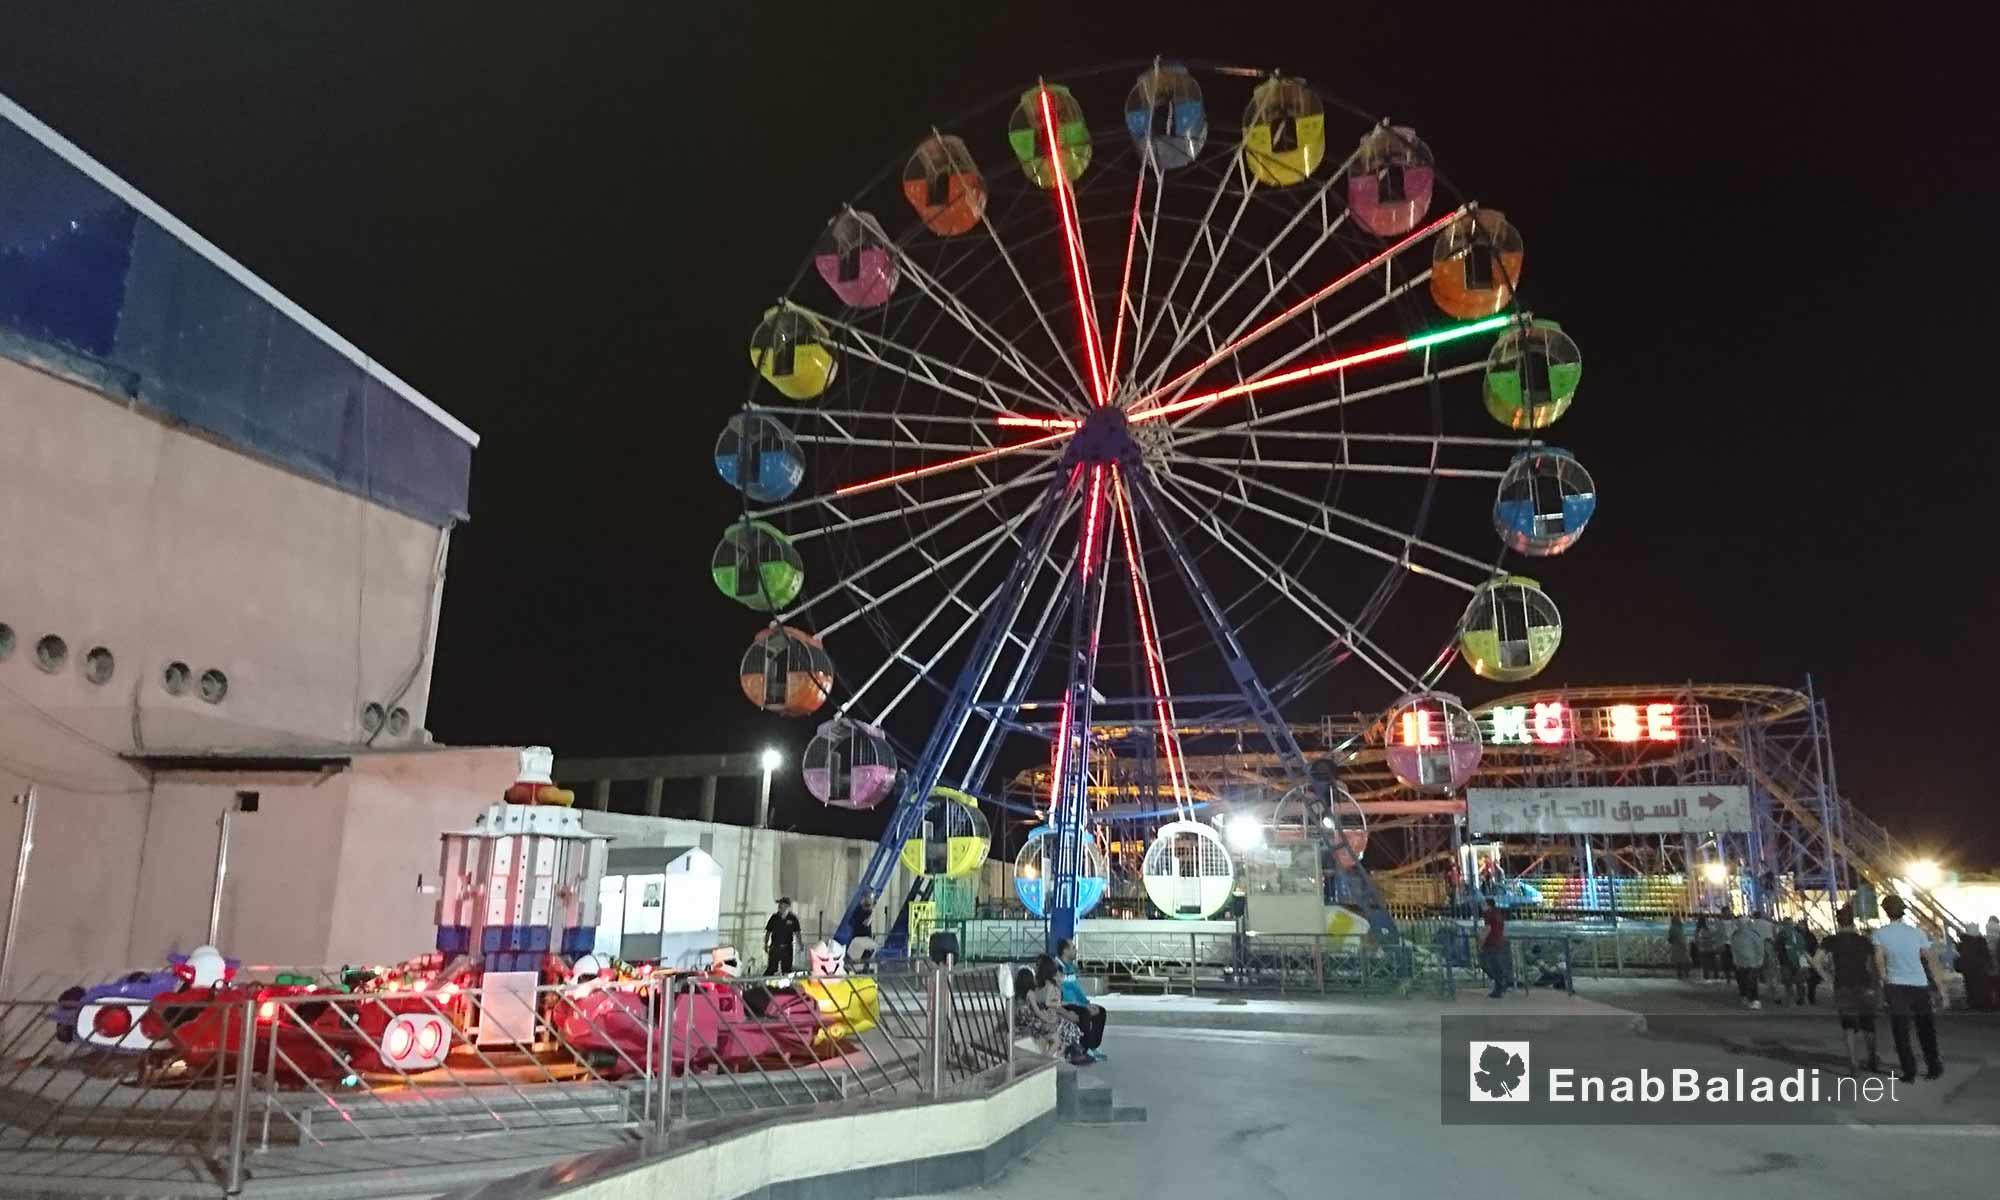 Amusement park at the Uptown Center, Mashrou Dummar – June 22, 2018 (Enab Baladi)